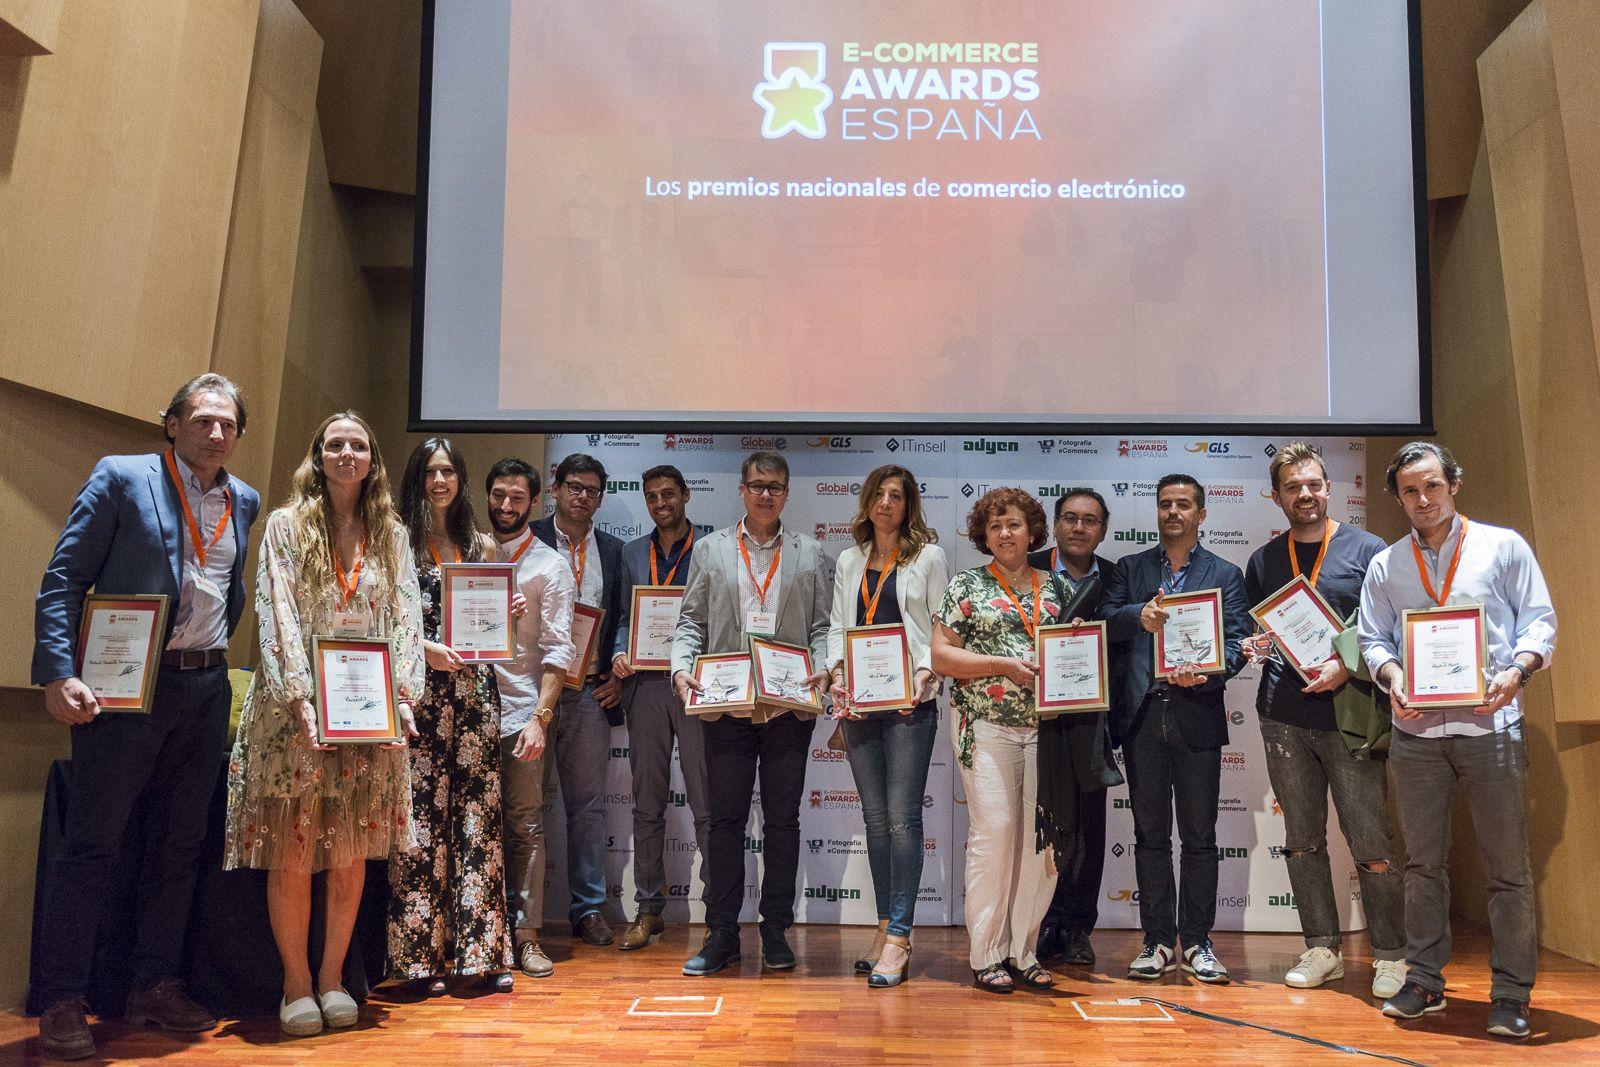 Foto de E-Commerce Awards 2017